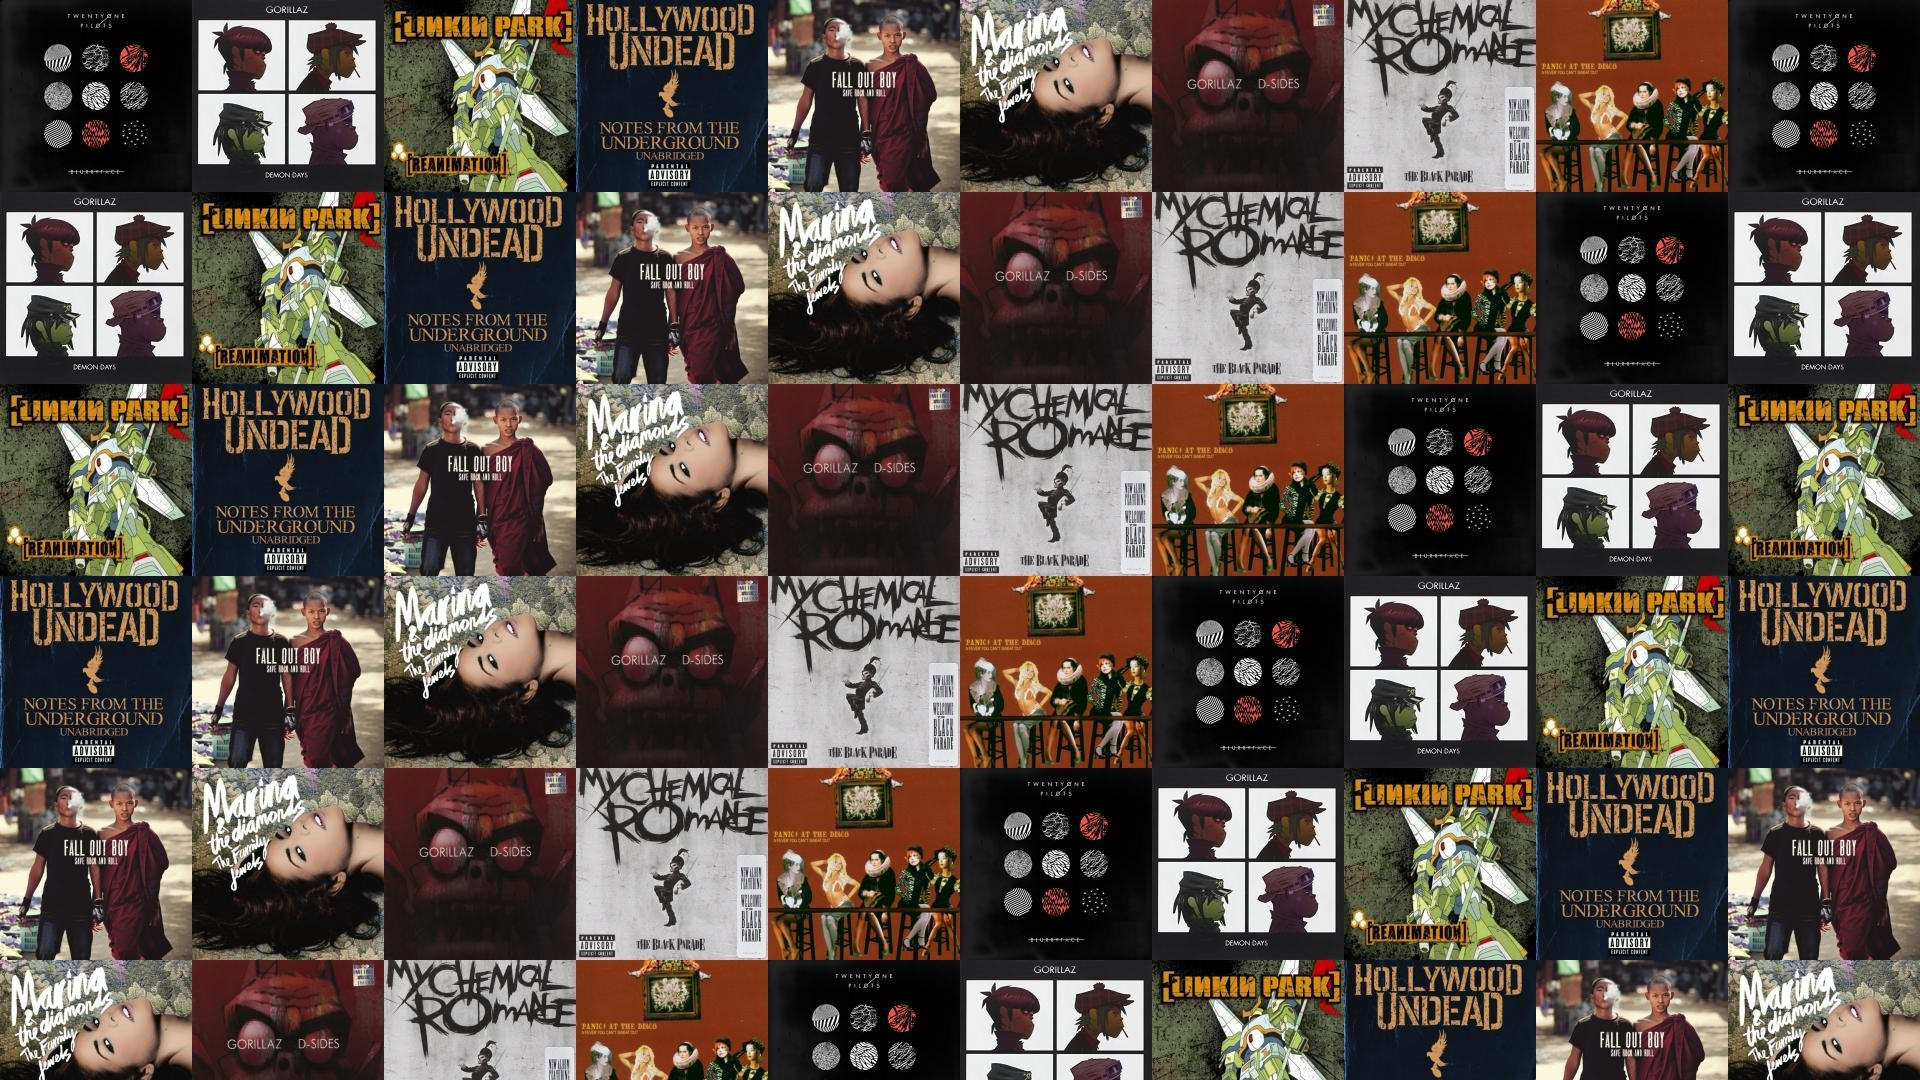 Fall Out Boy Android Wallpaper Twenty One Pilots Desktop Wallpaper 183 ① Download Free